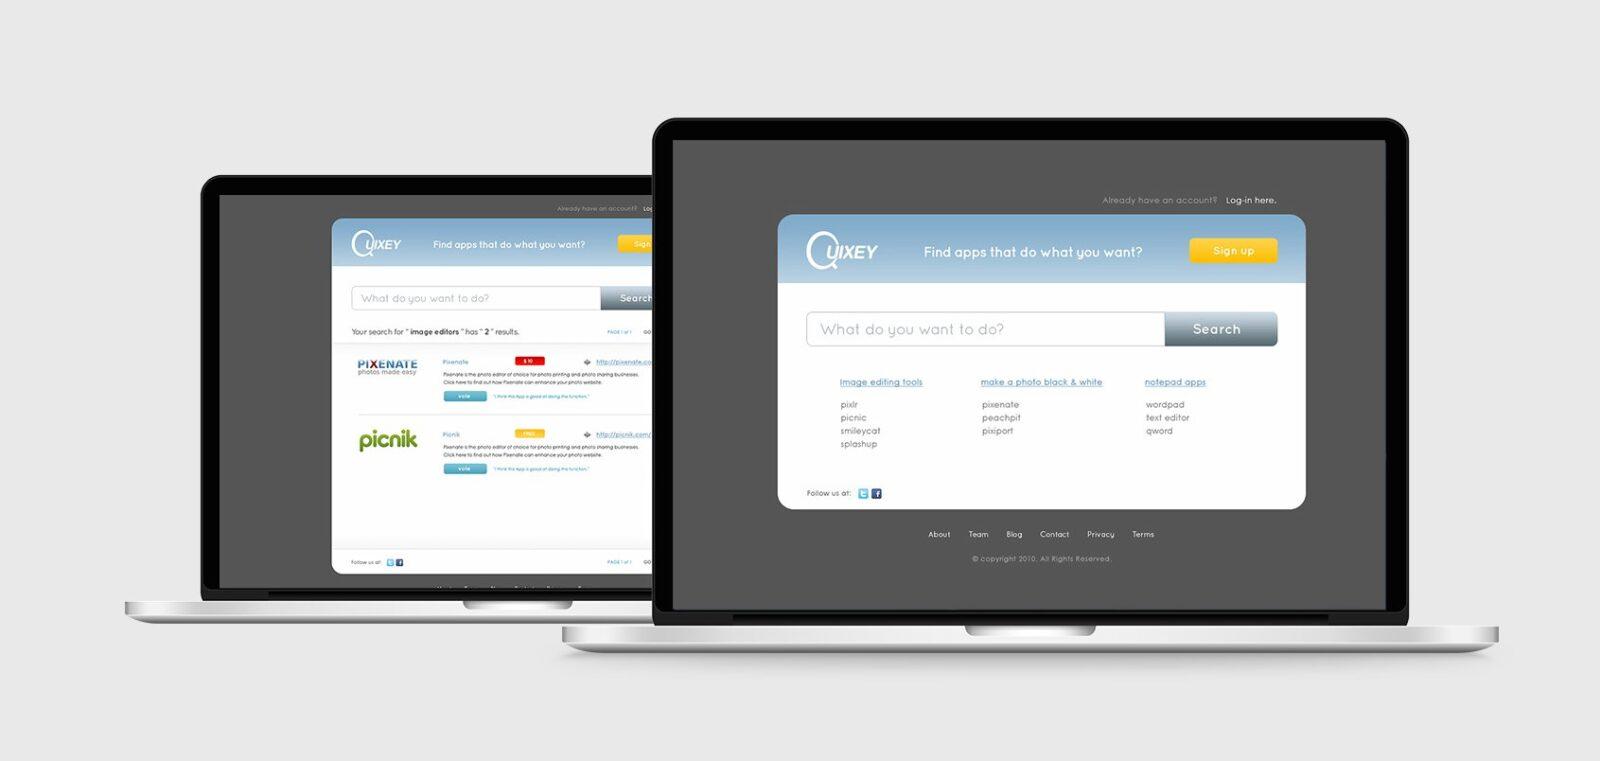 shopify web development company, ecommerce web solutions